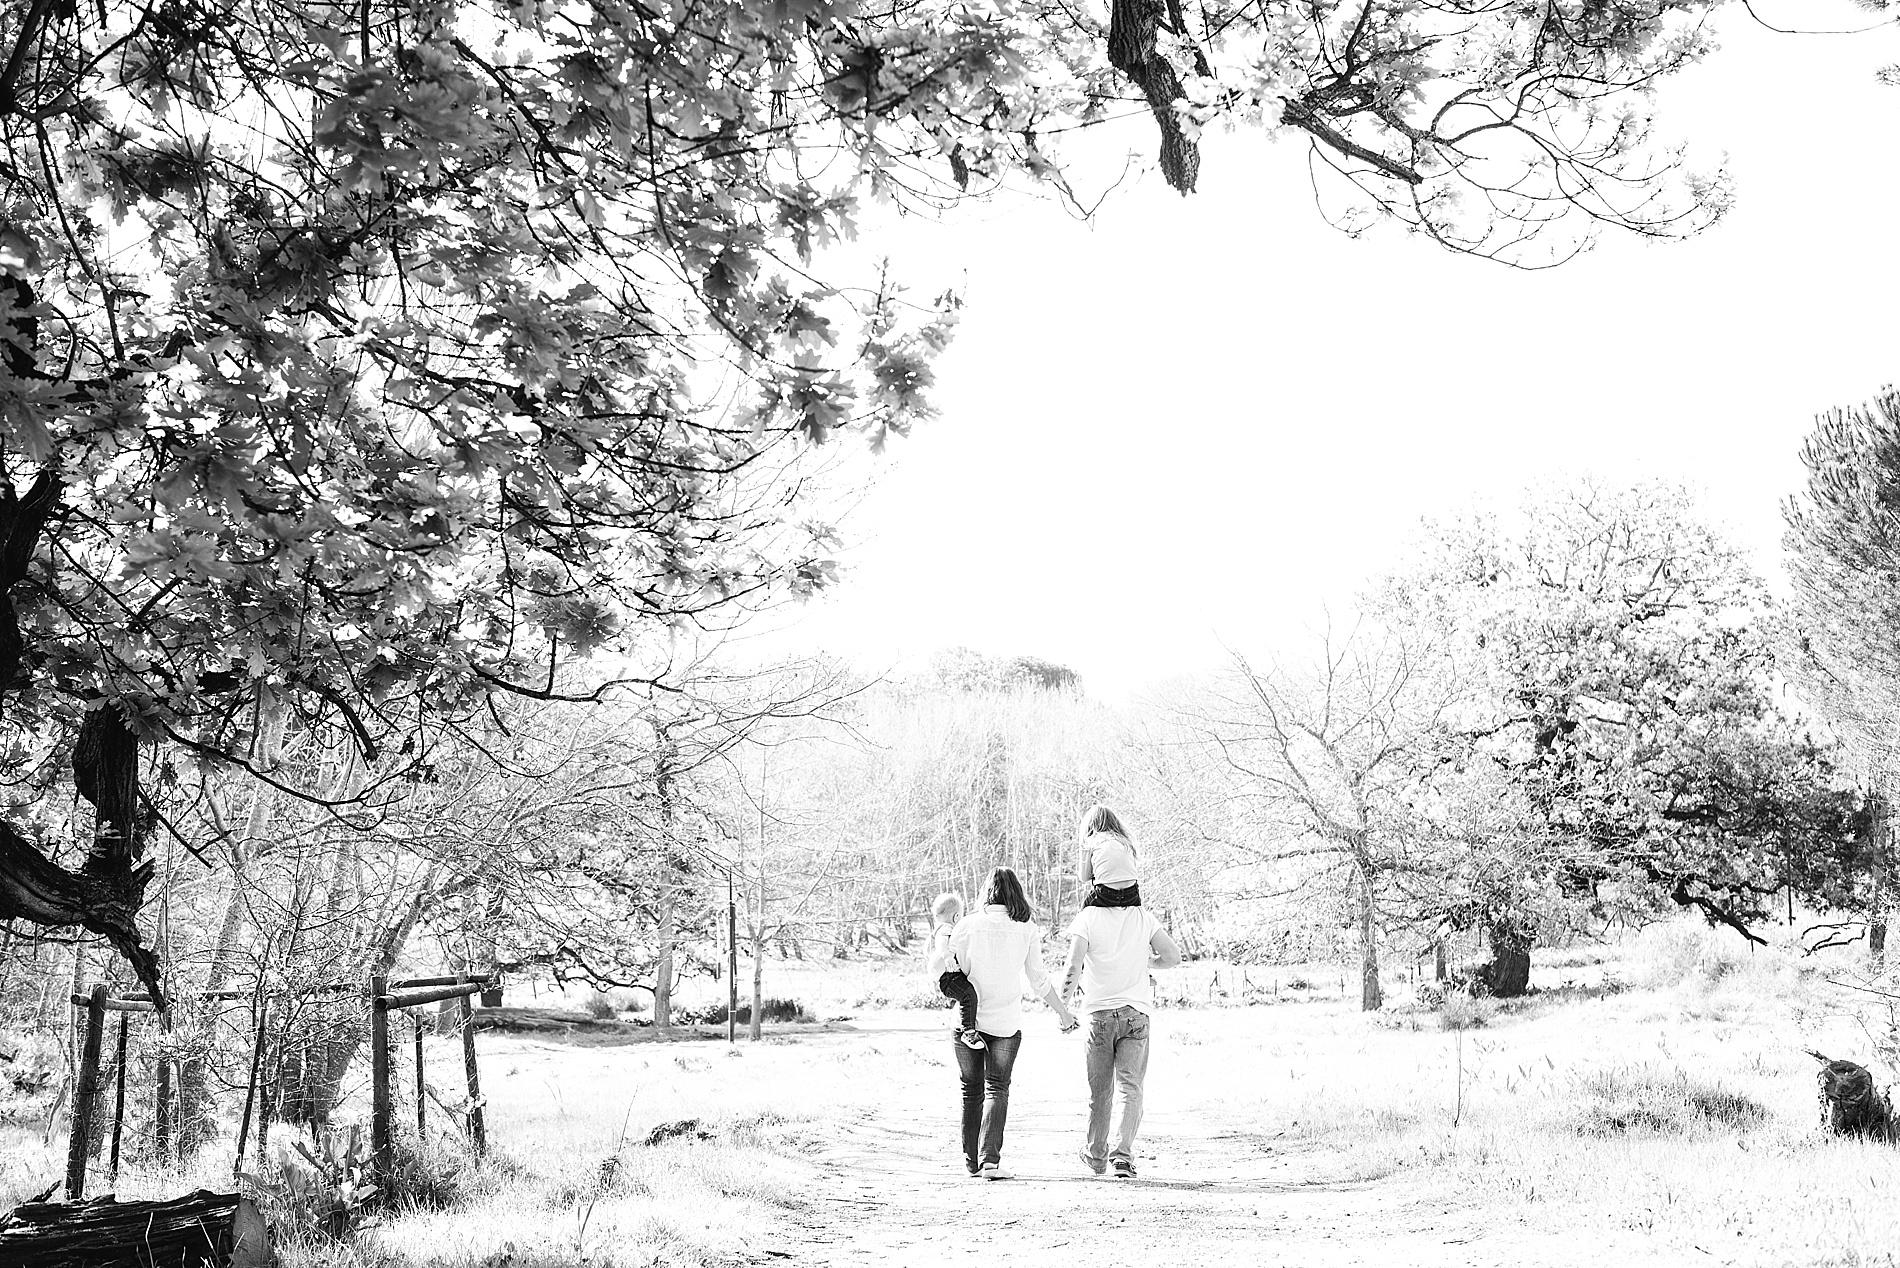 Darren-Bester-Photography-Cape-Town-Photographer-Painczyk-Family-Family-Portraits-_0026.jpg